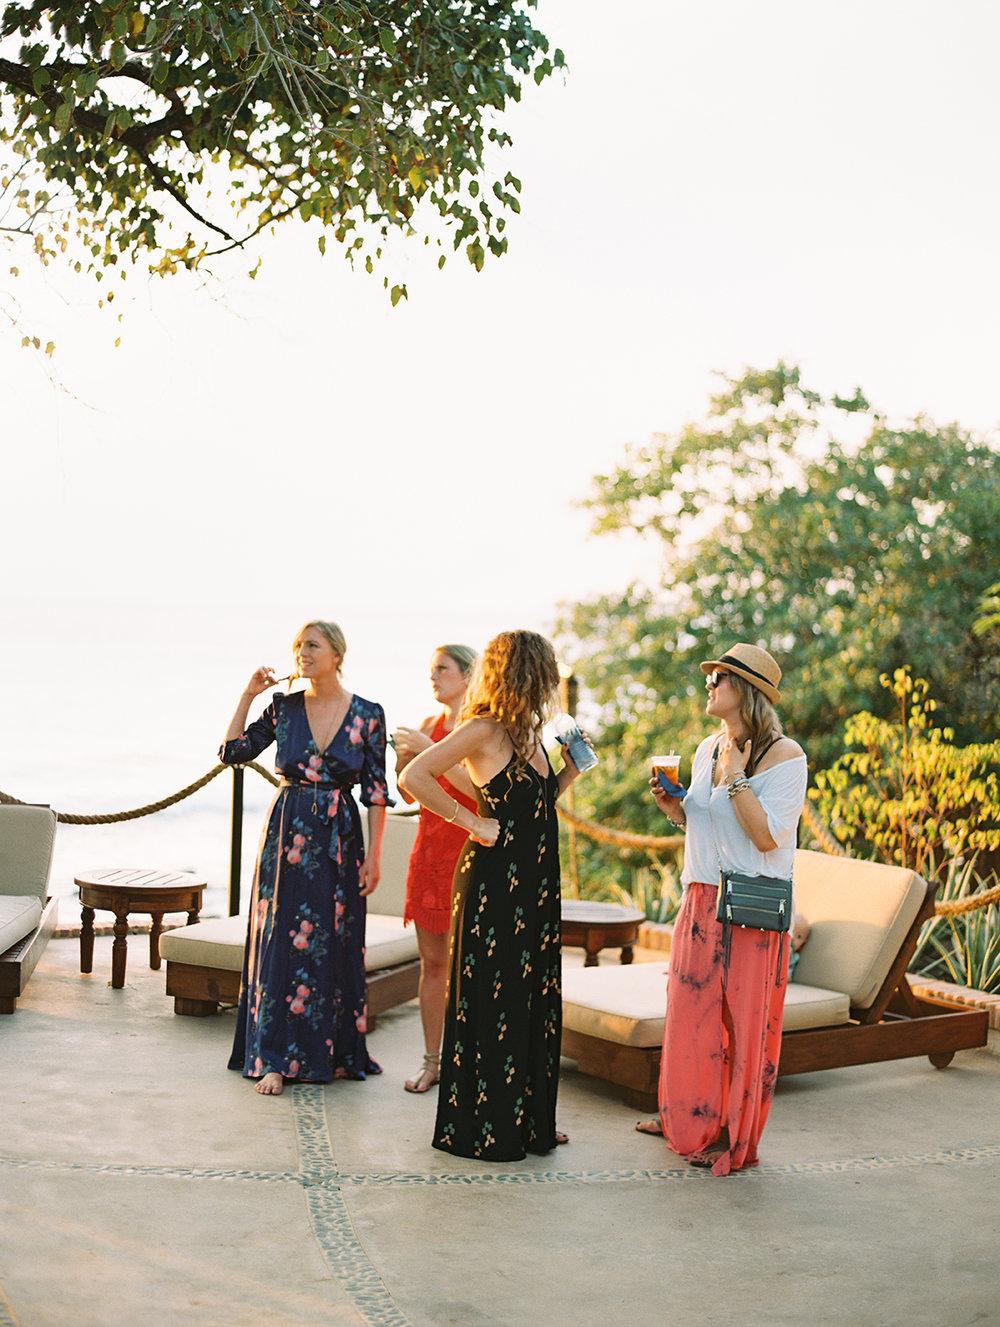 063-fine-art-film-photographer-wedding-engagement-jacob+cammye-destination-wedding-nicaragua-brumley & wells photography-rehearsal-dinner.jpg